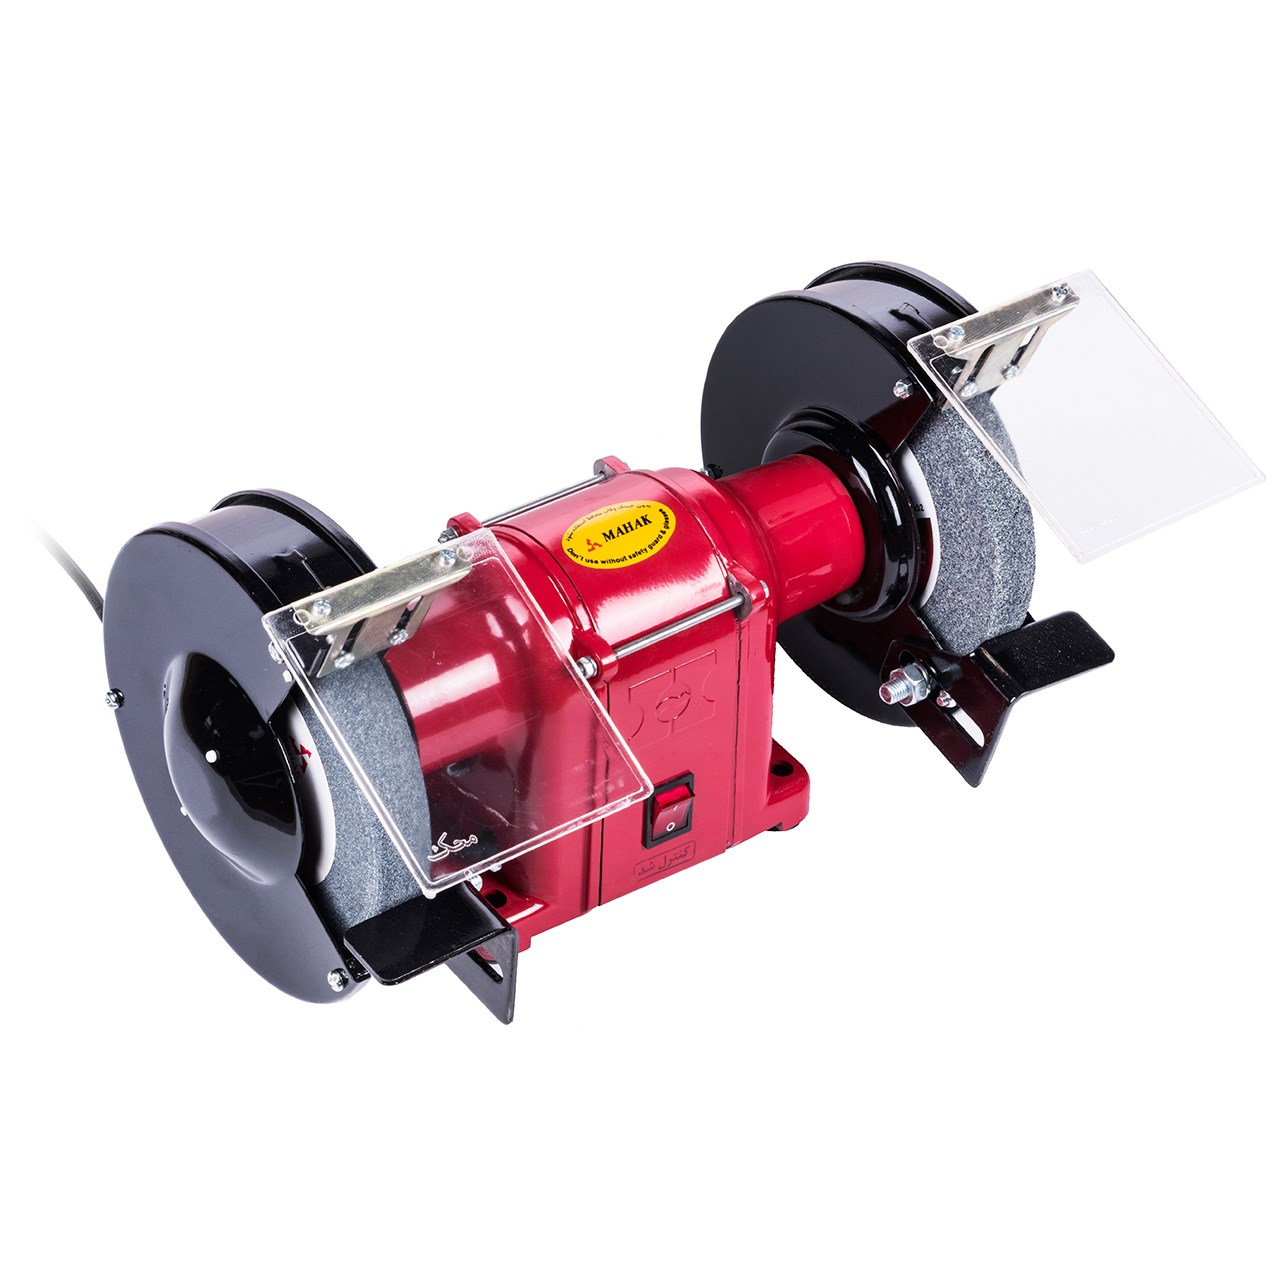 چرخ سنباده محک مدل GD175H